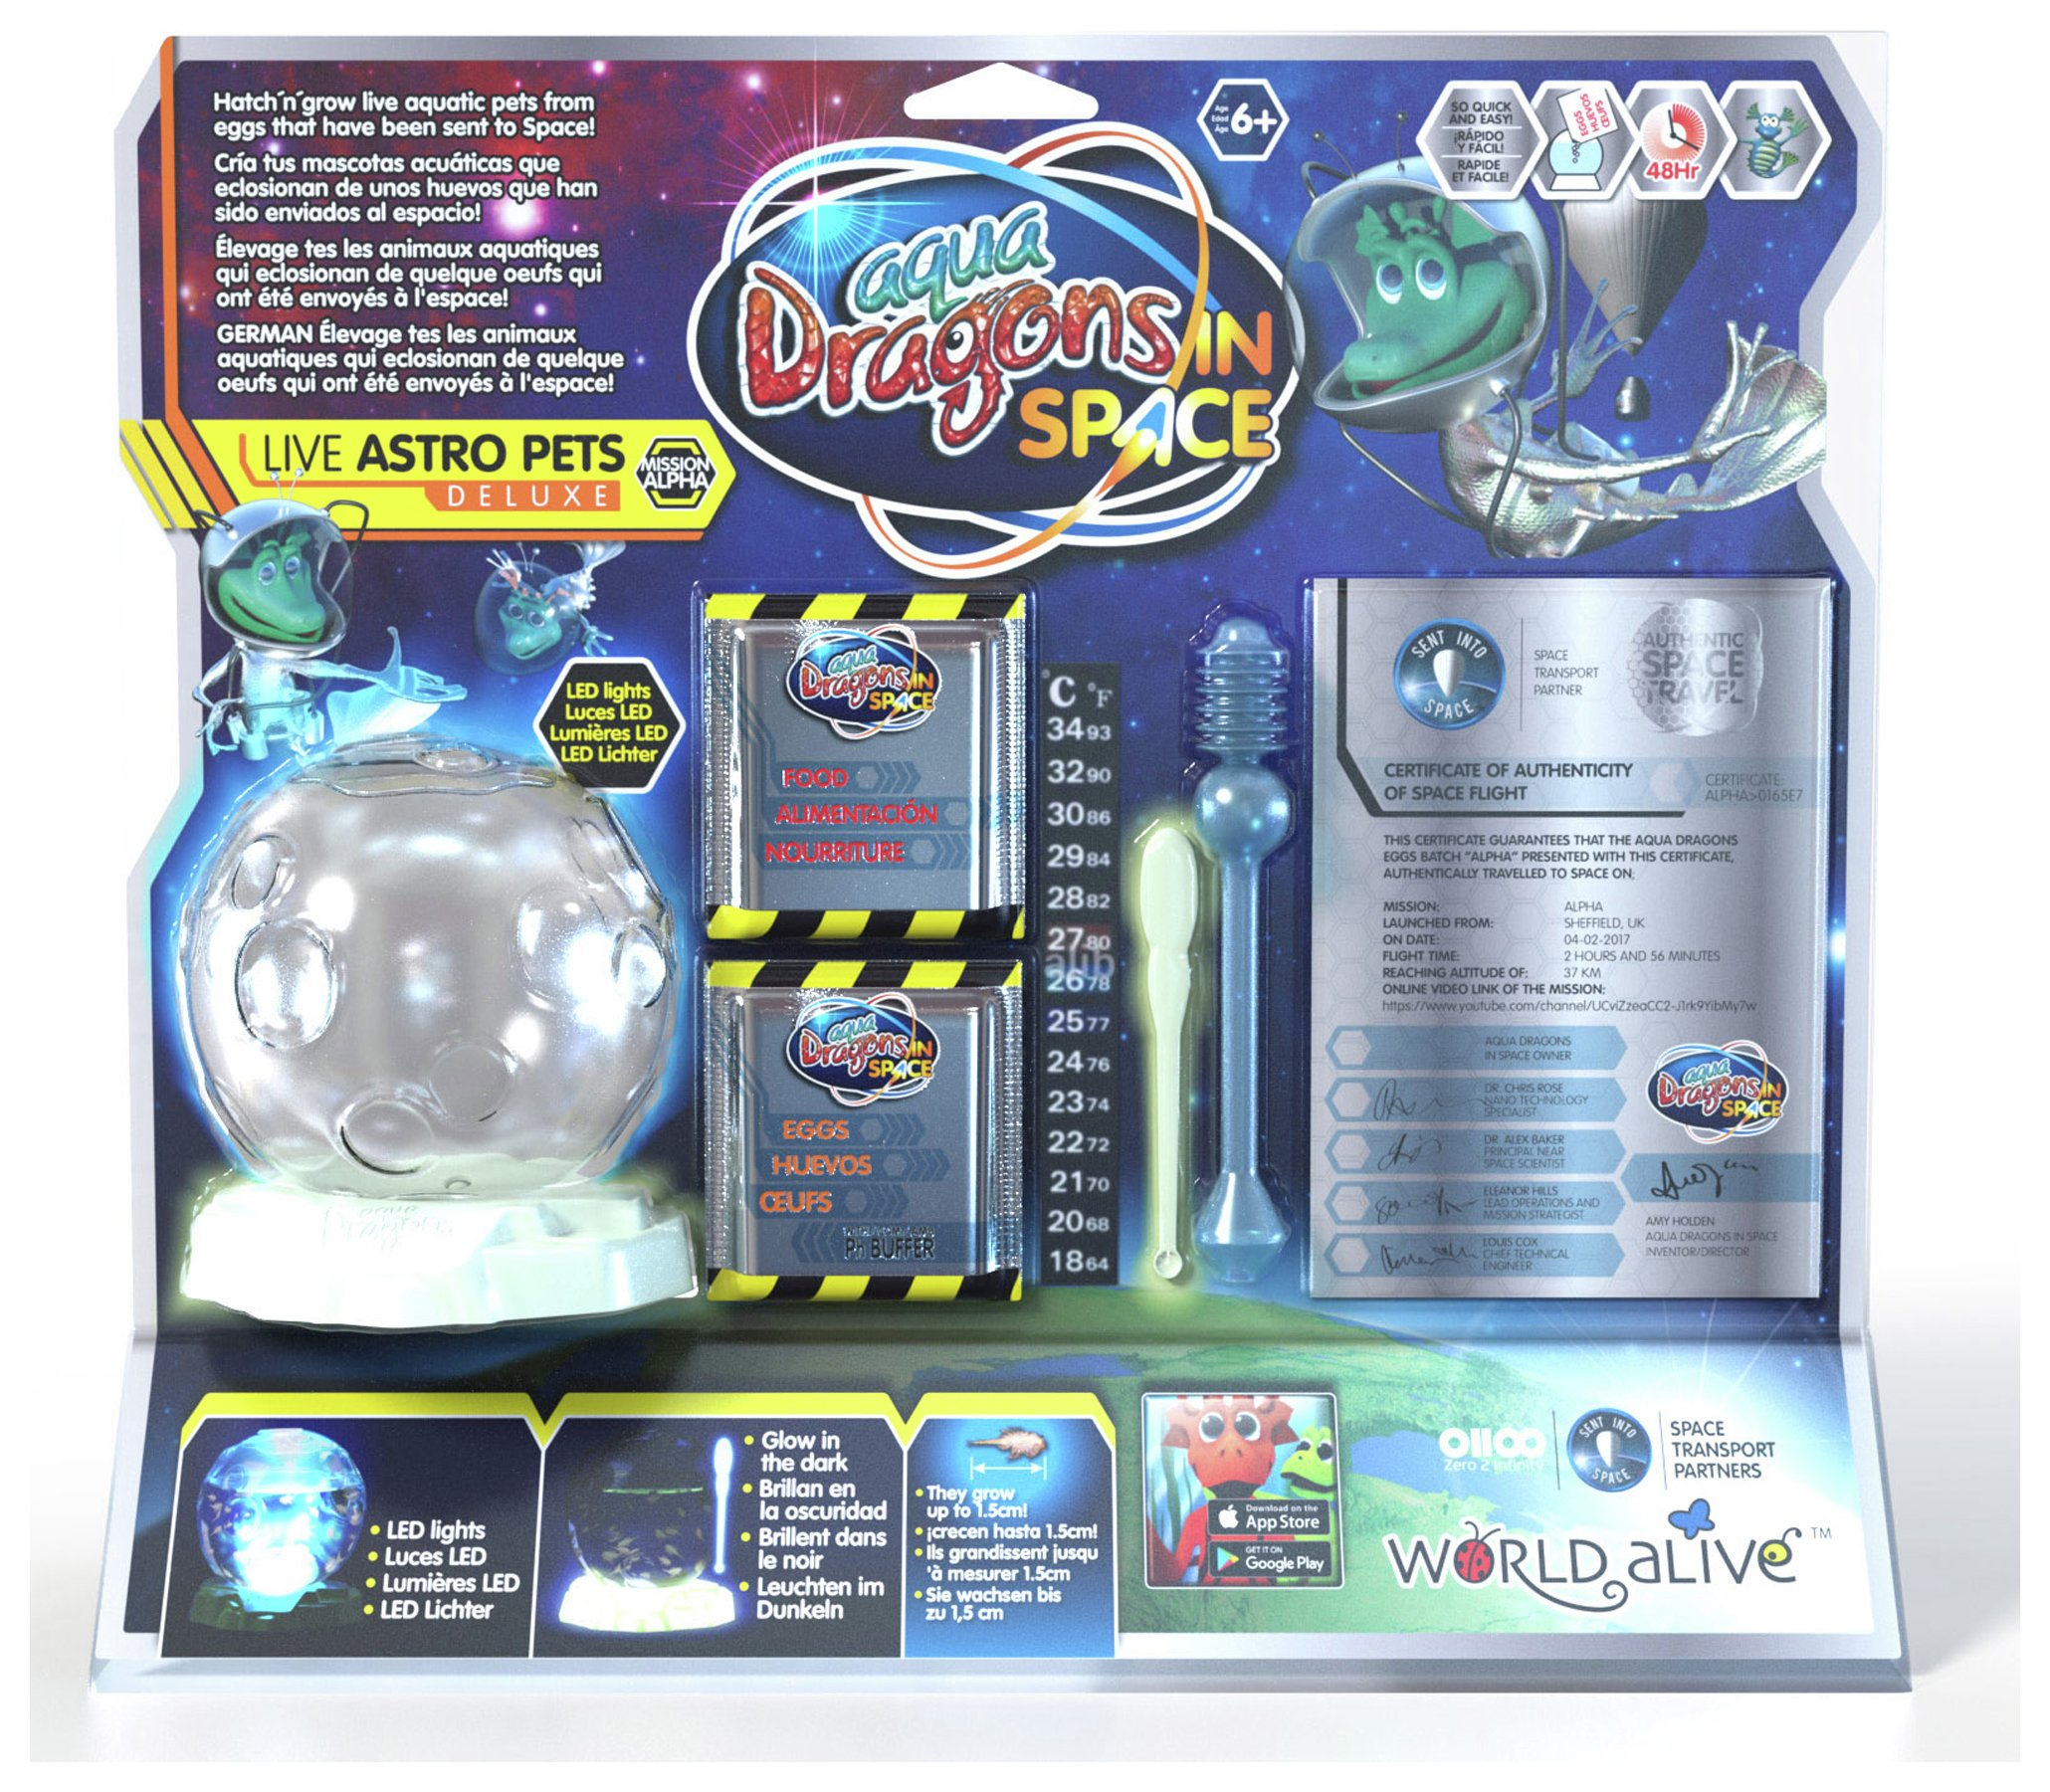 Image of Aqua Dragons Live Astro Pets Deluxe.